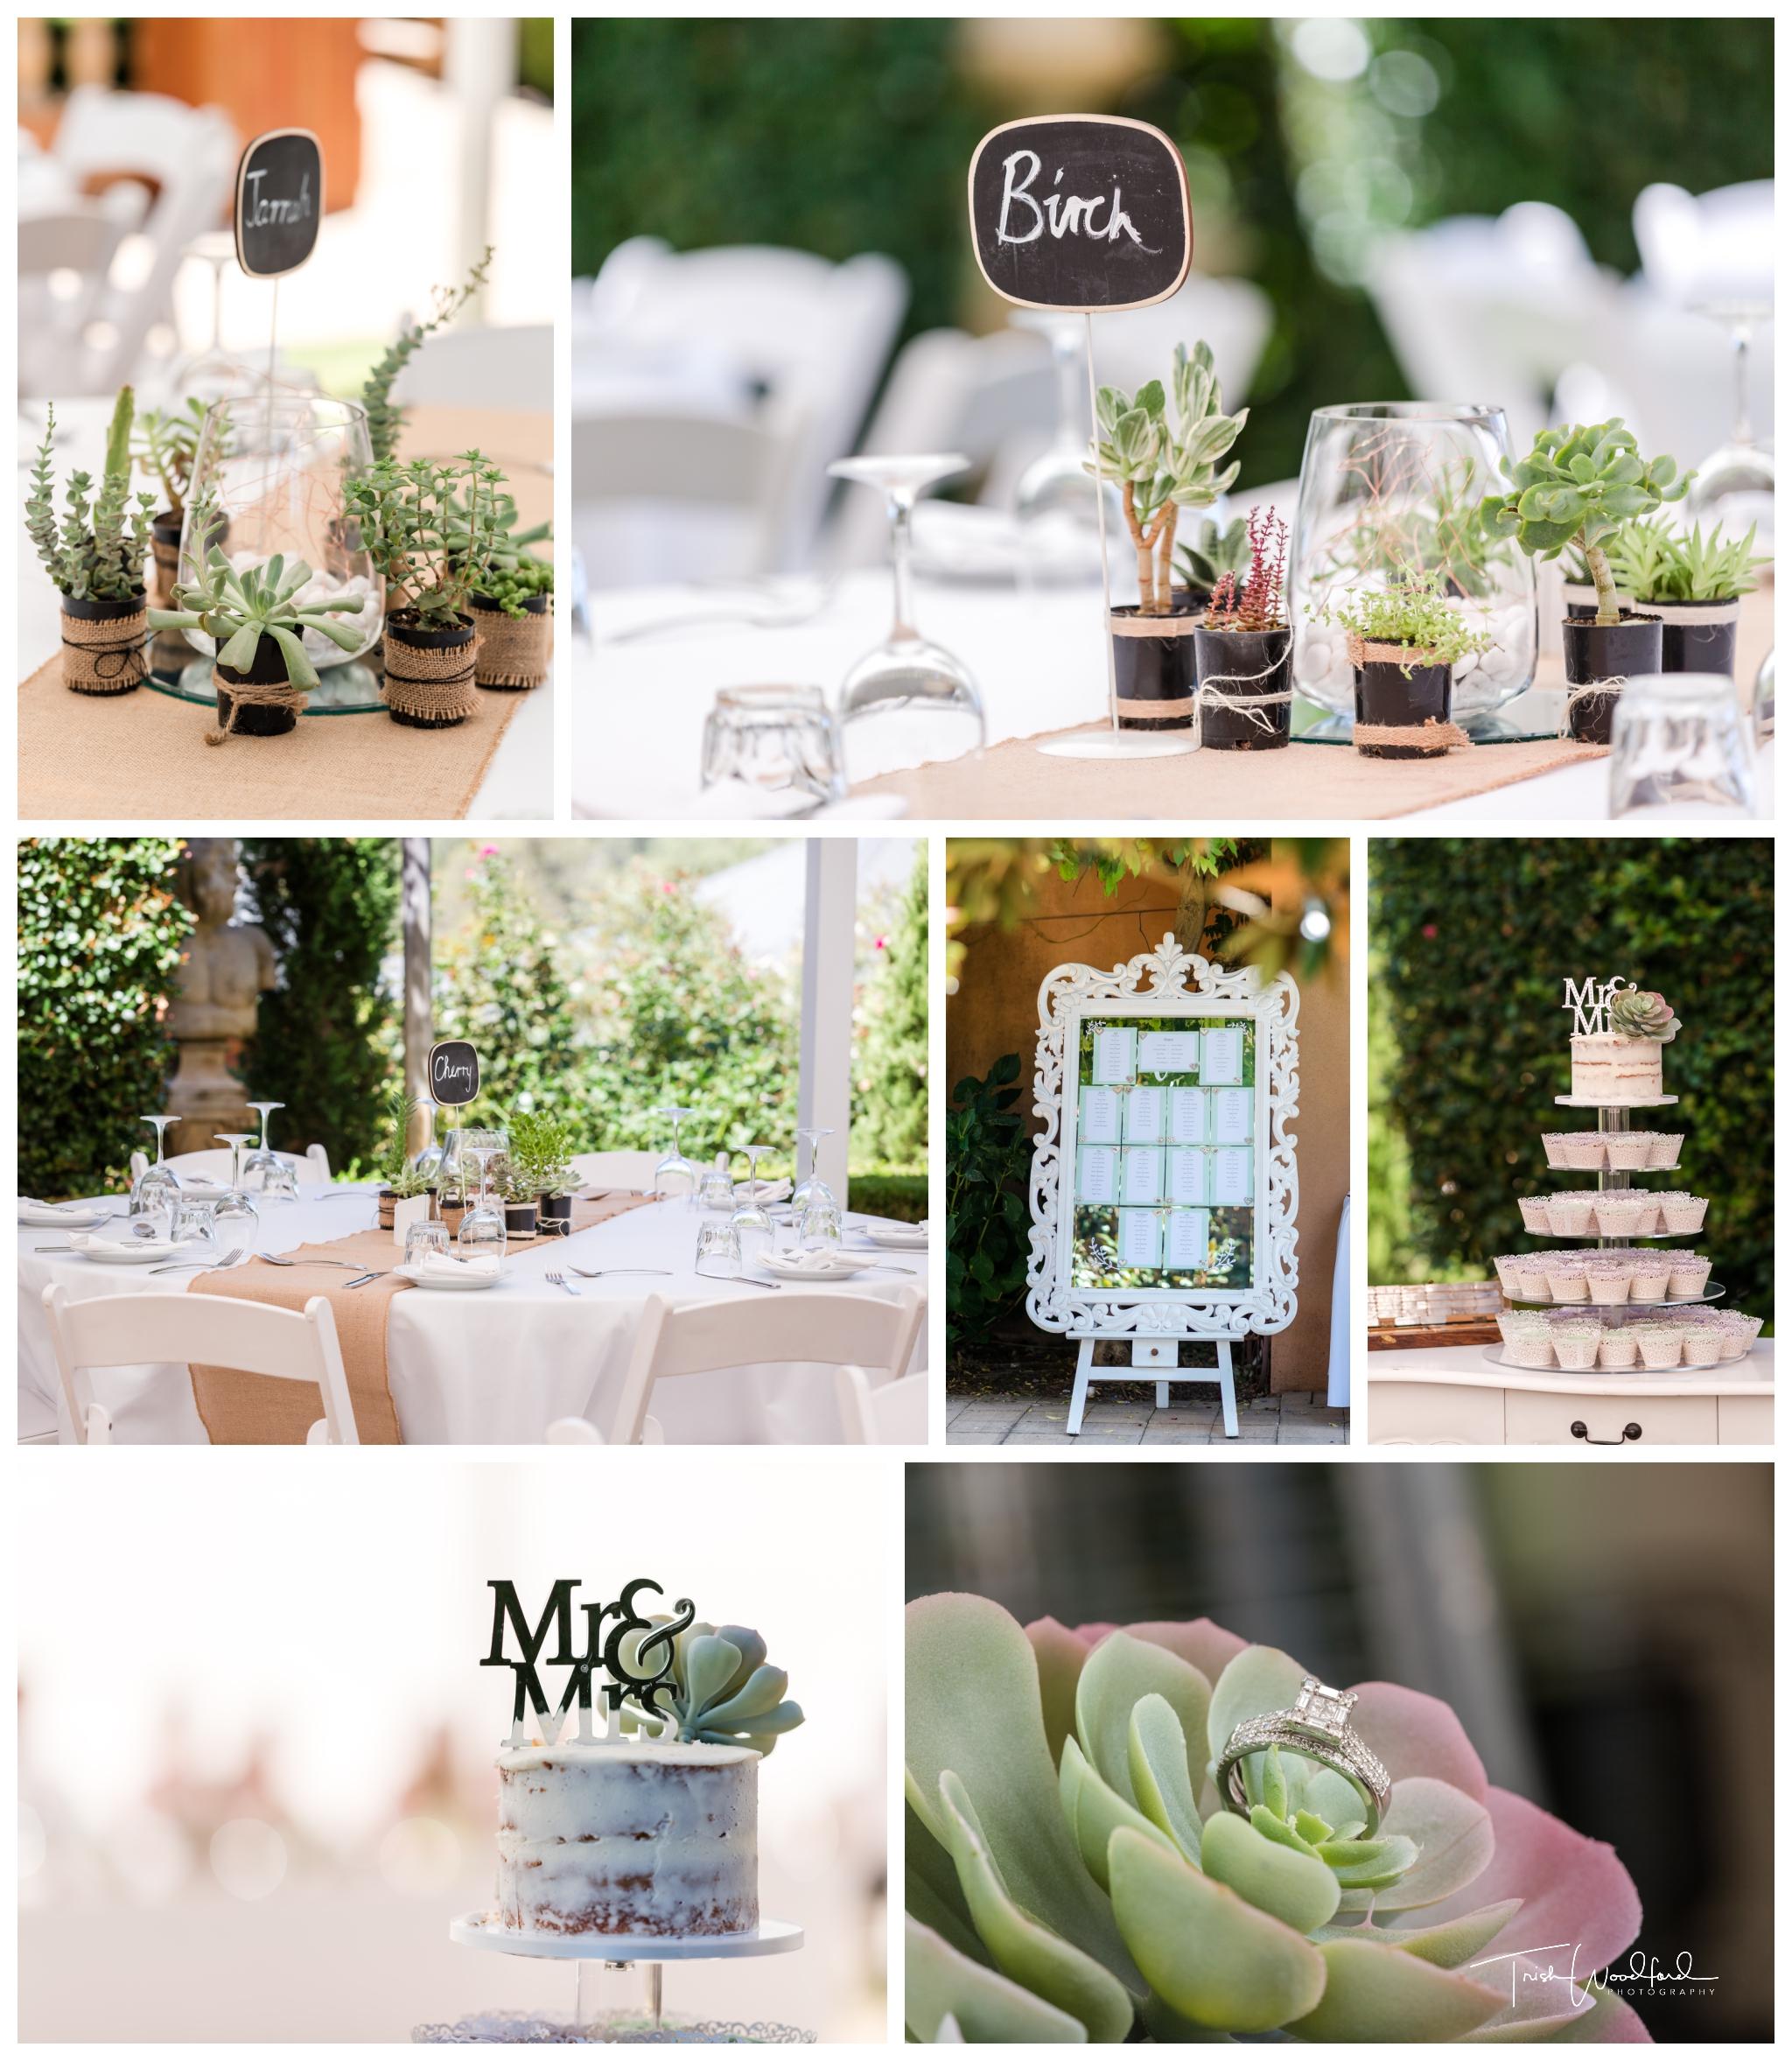 masonmill-wedding-reception-details